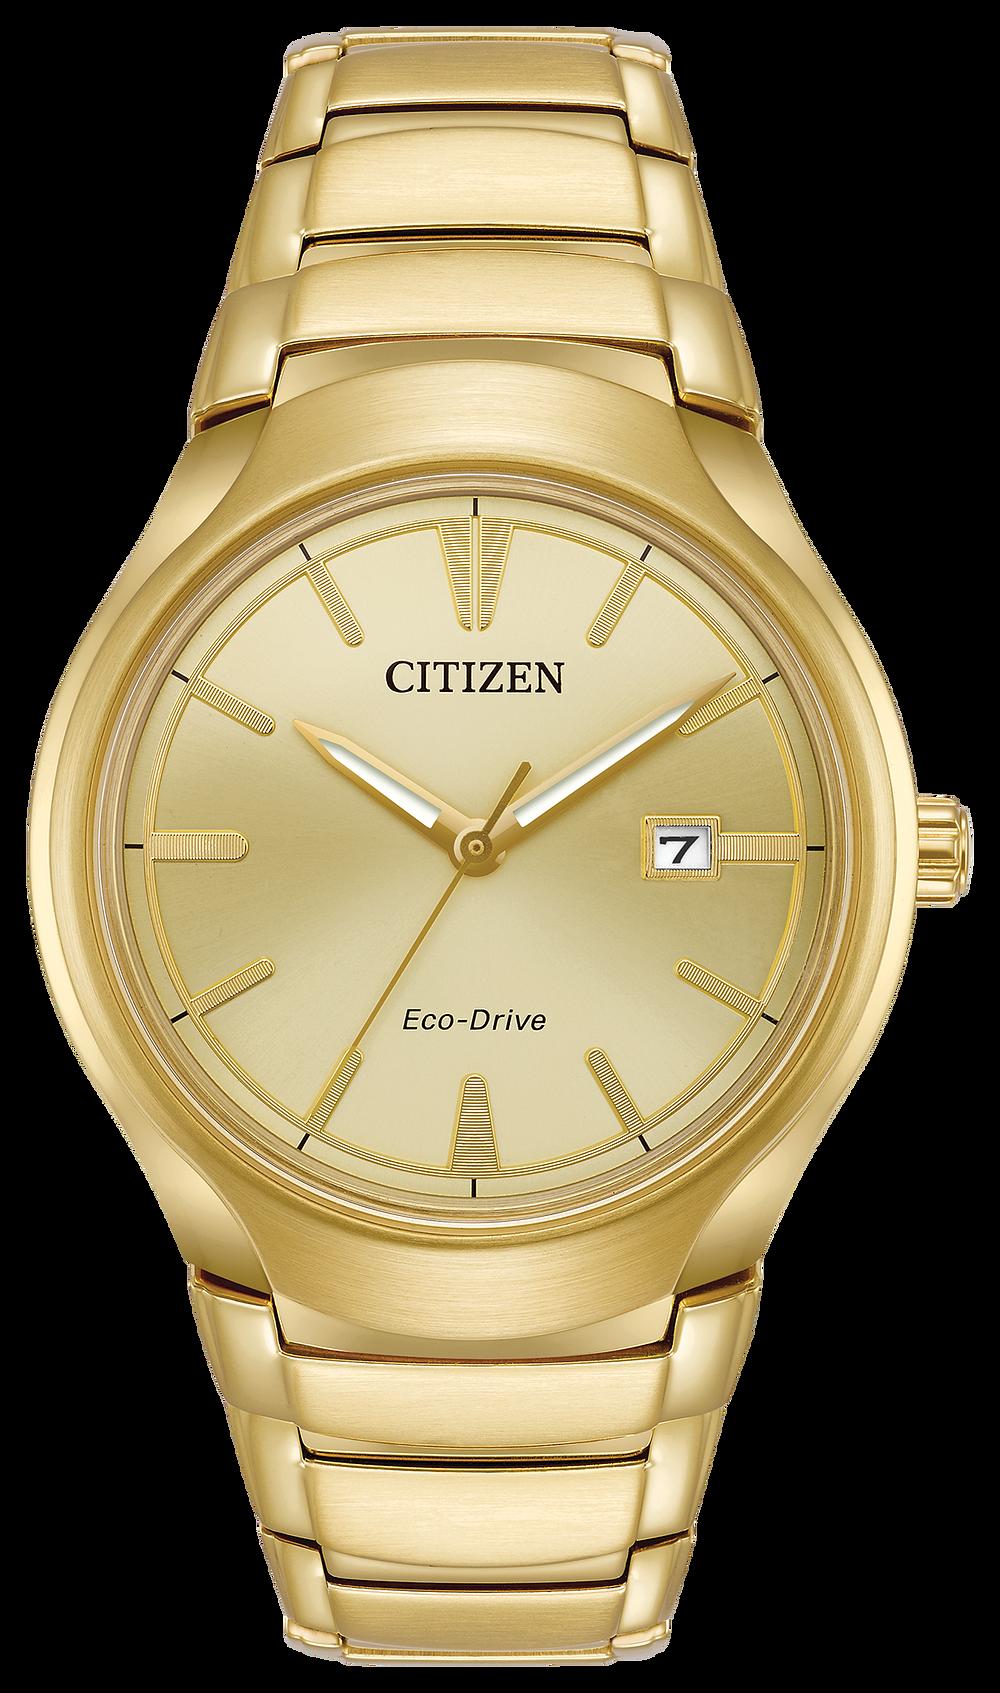 Citizen Watches for Men & Women – Buy Online India at ...